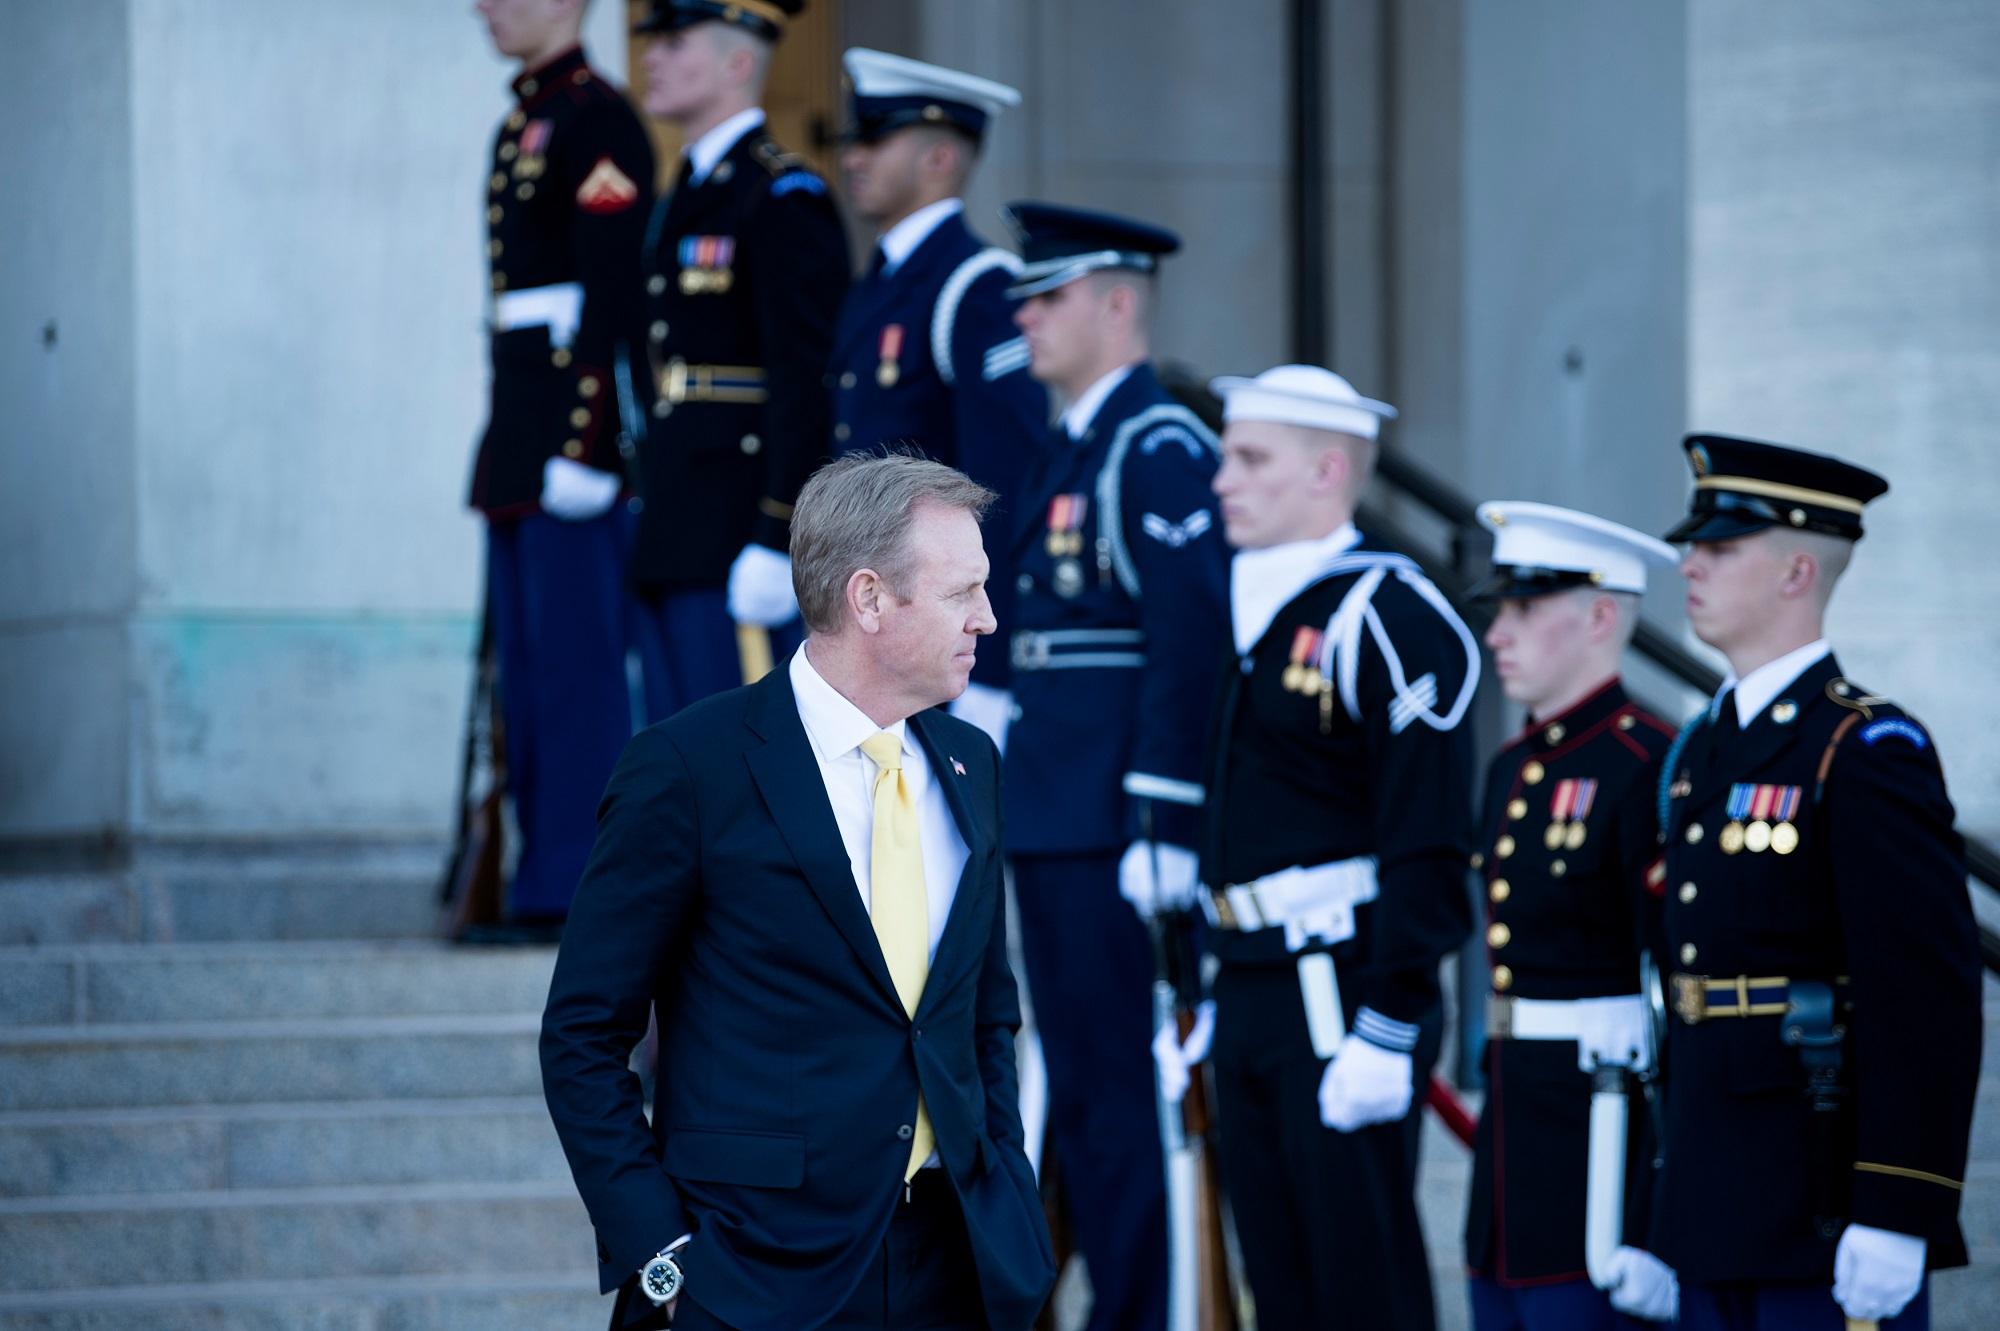 Unwinding bureaucracy: Start of 2018 to see major Pentagon reform